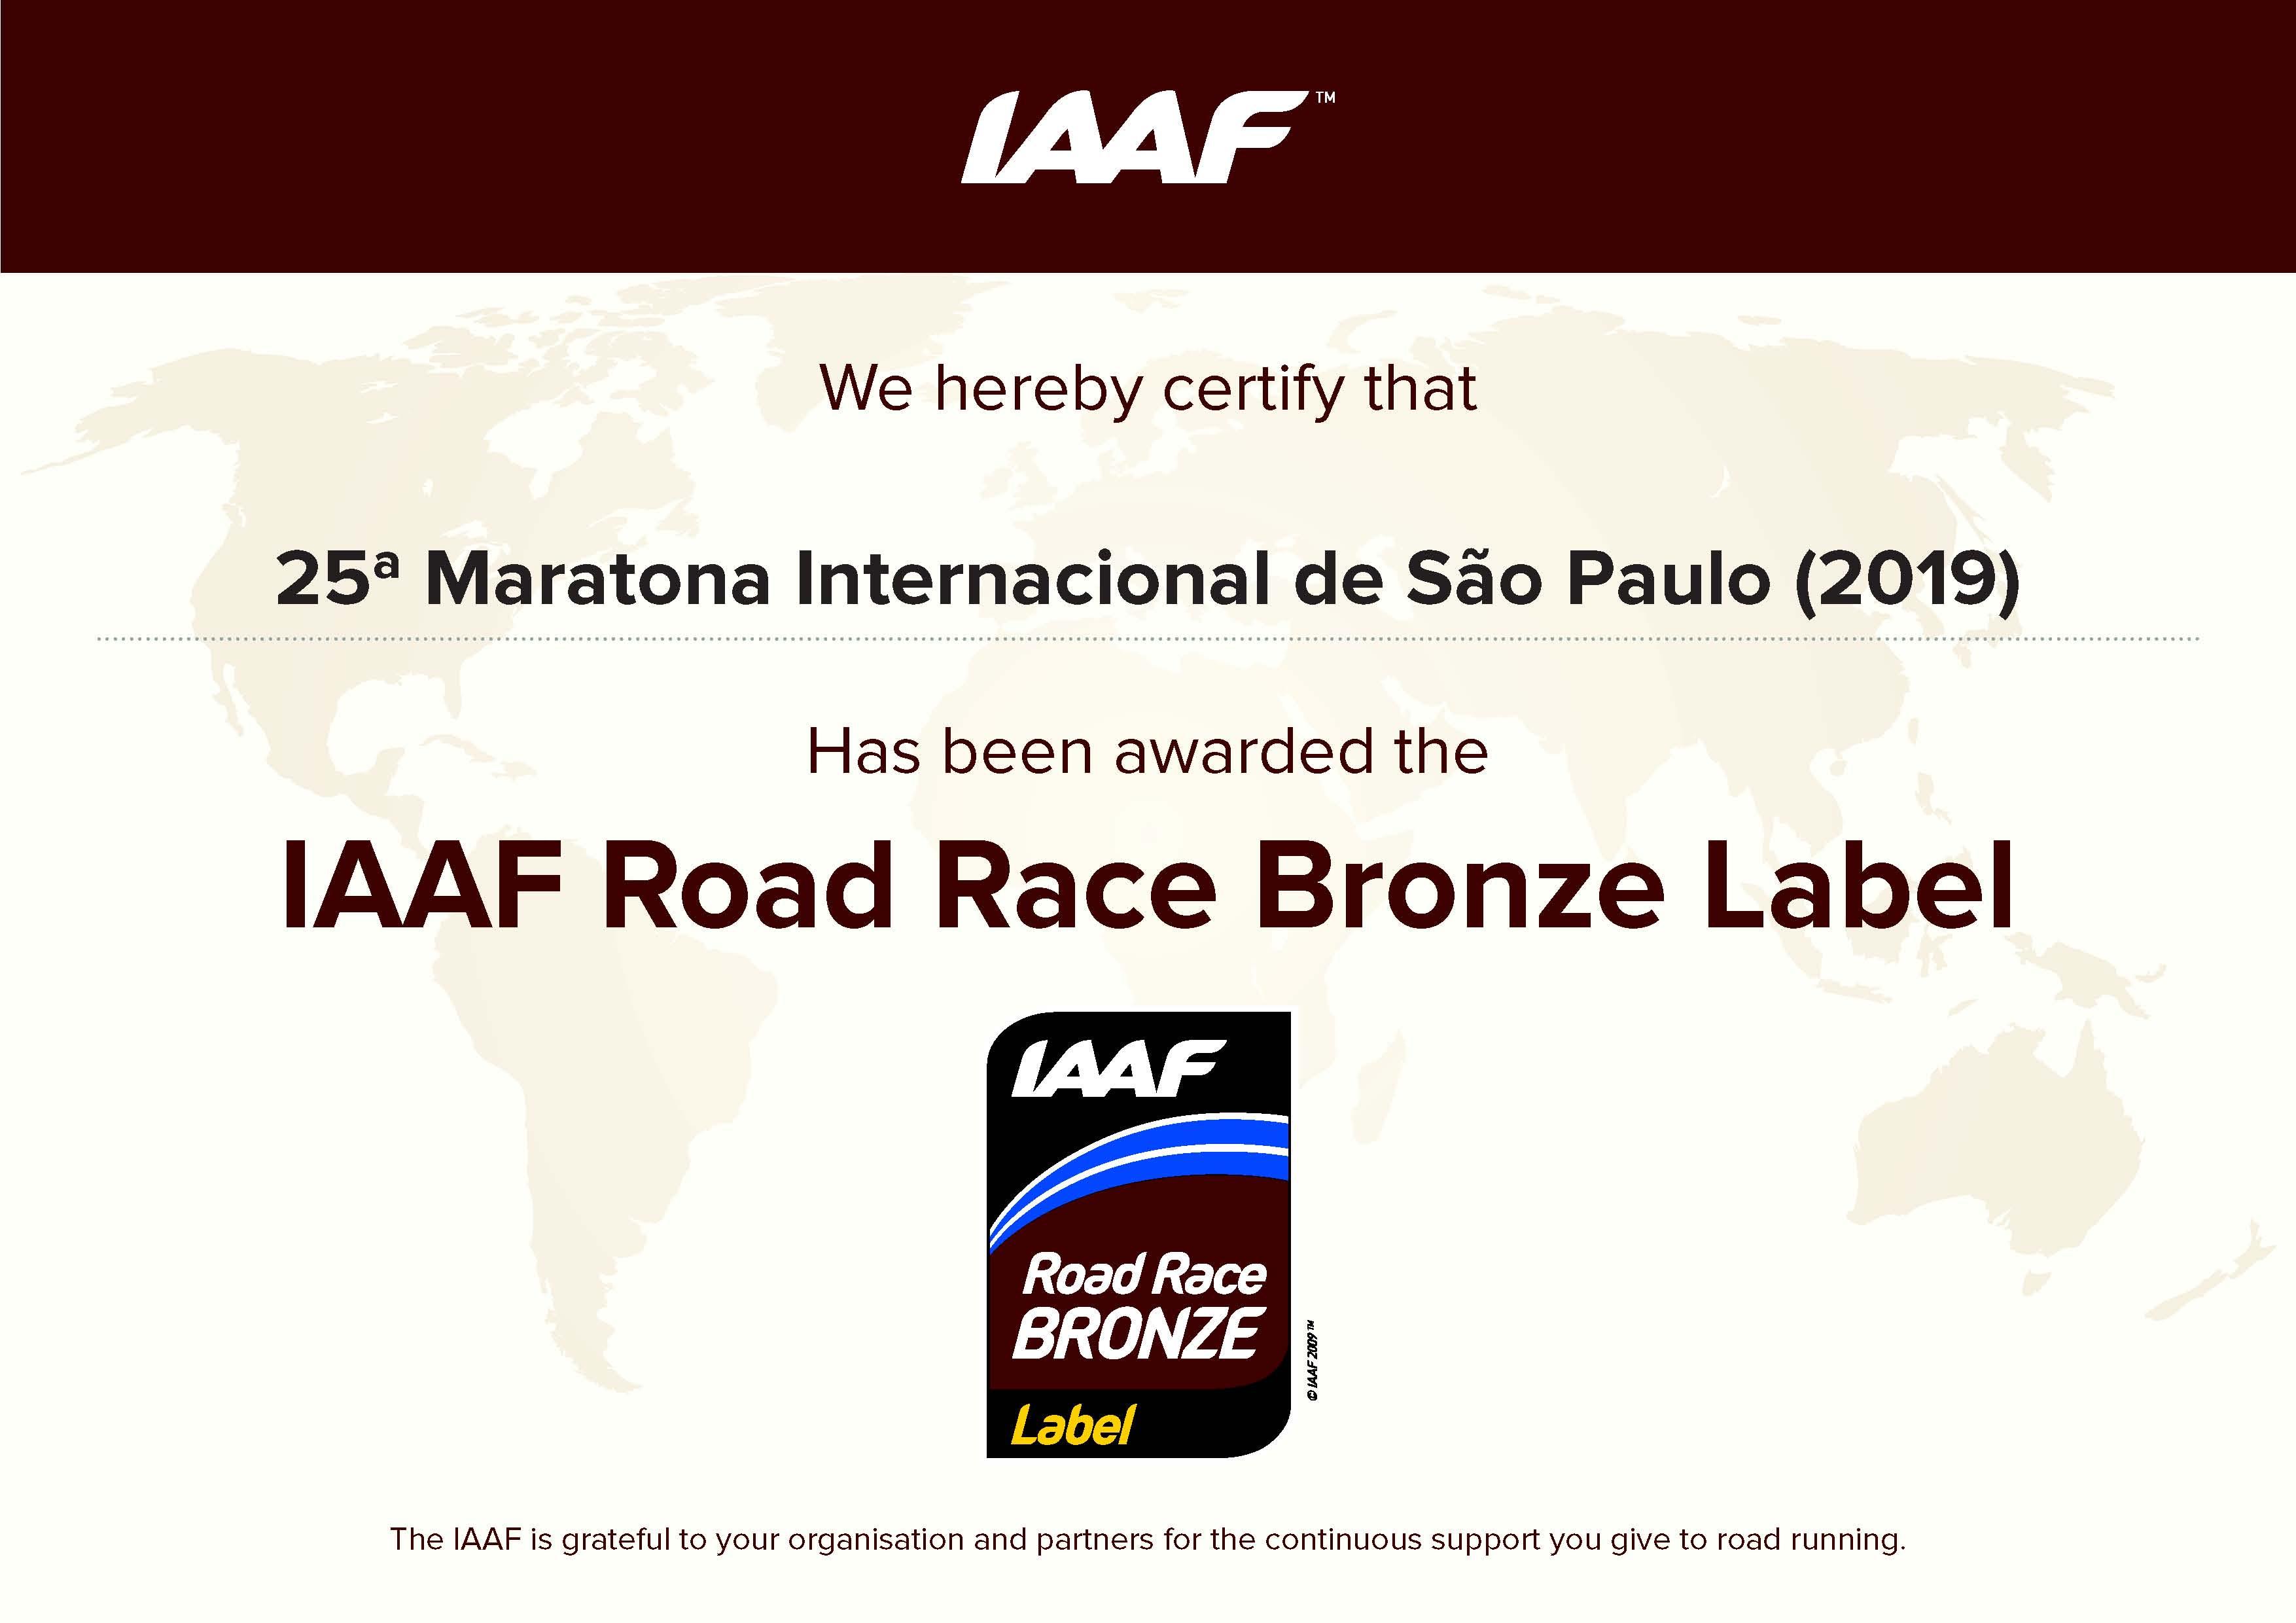 Brasil recebe 1&#170; Prova Bronze IAAF e Maratona   de S&#227;o Paulo 2019 eleva seu status<